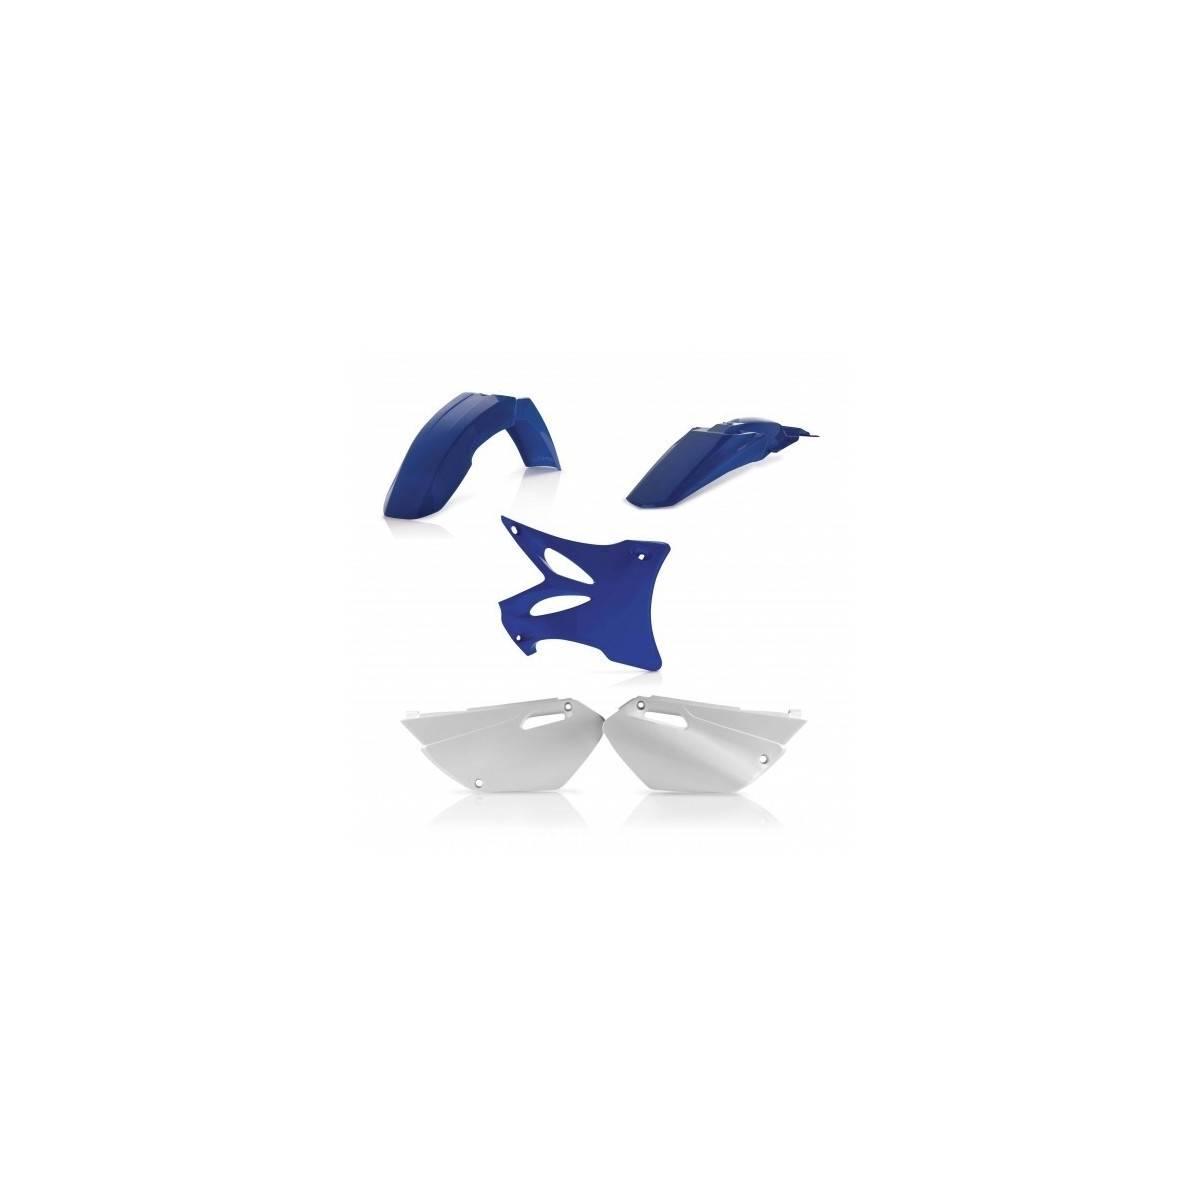 0021749-553 - Kit Plasticos Wrf 250 15 17 Wrf 450 16 17 Origen